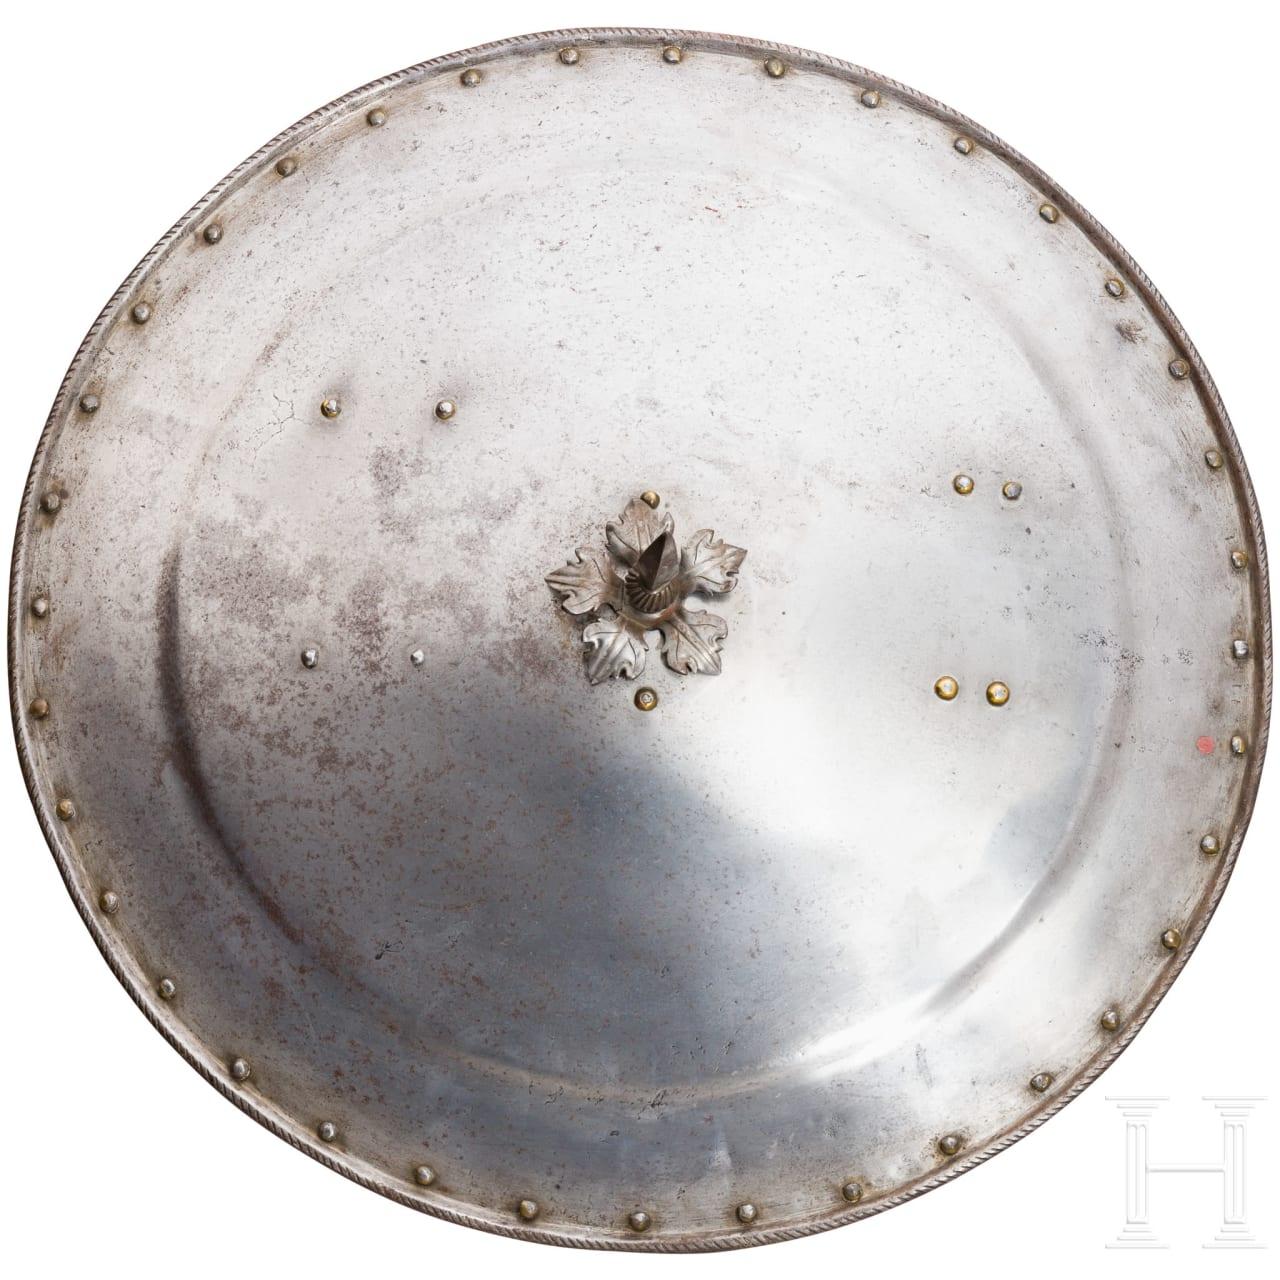 A German iron round shield, circa 1600